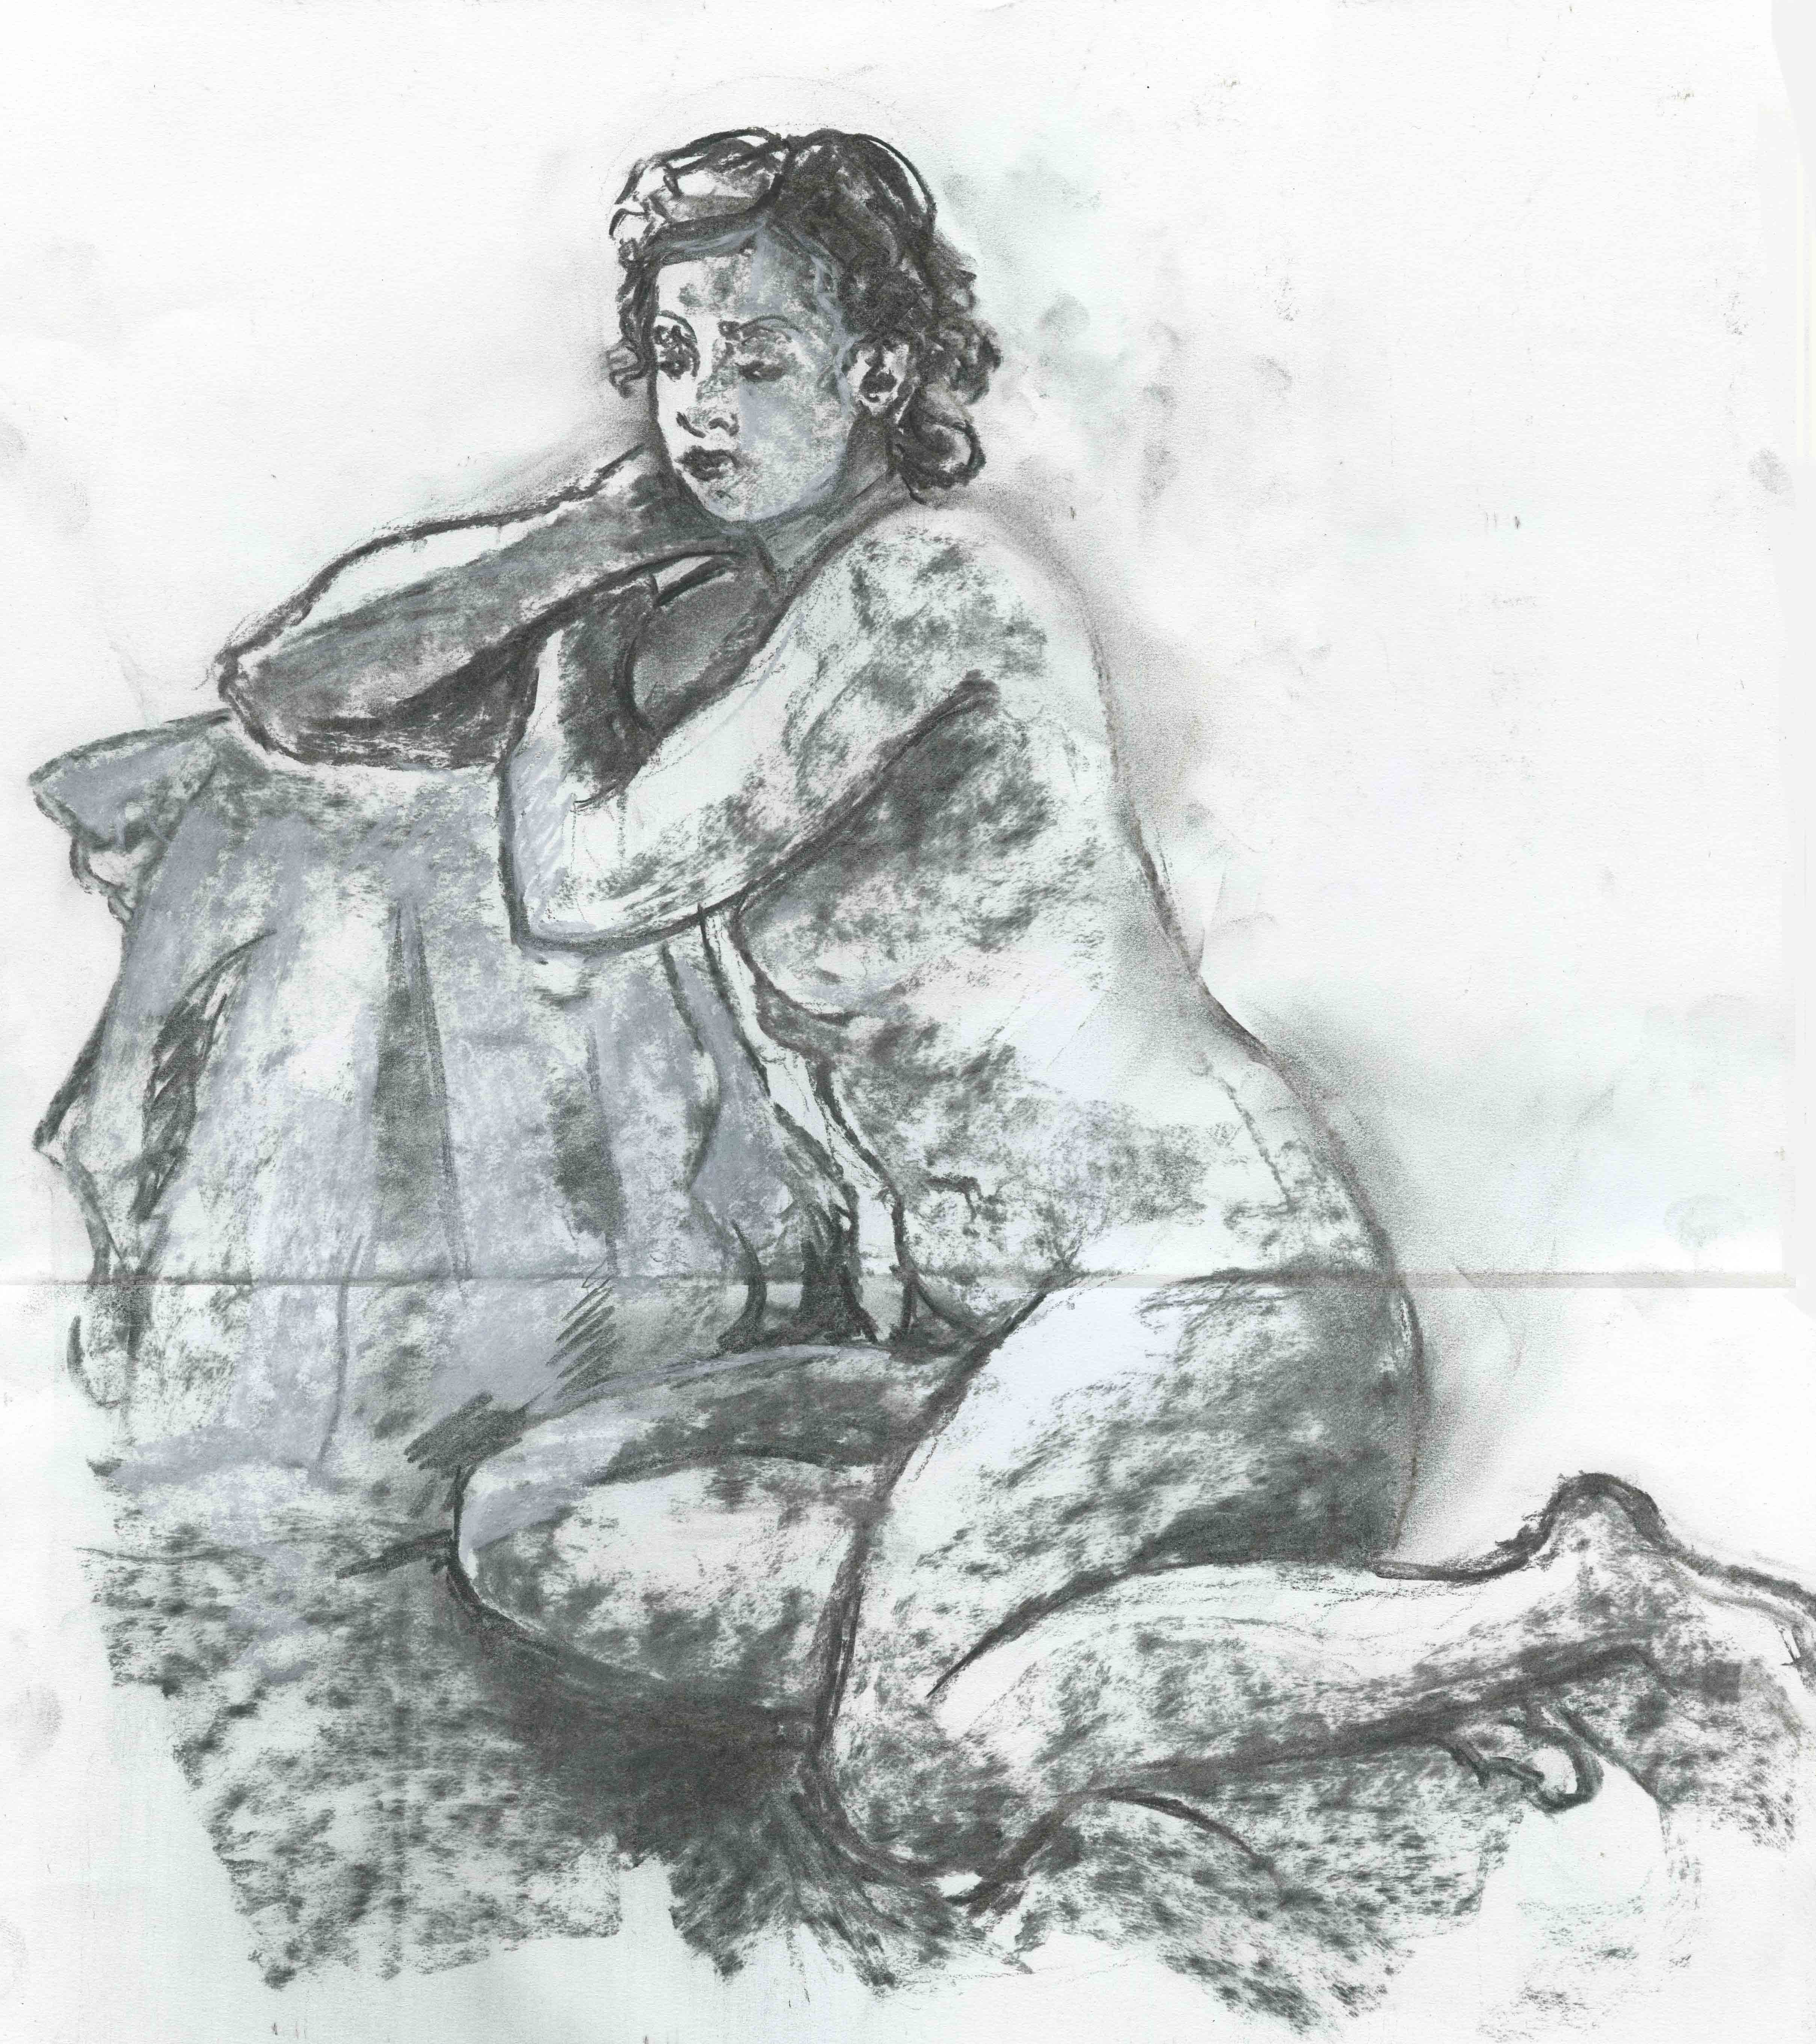 Noomis - Etudes, croquis & Wip [ Nudité ] - Page 3 160519121428638763